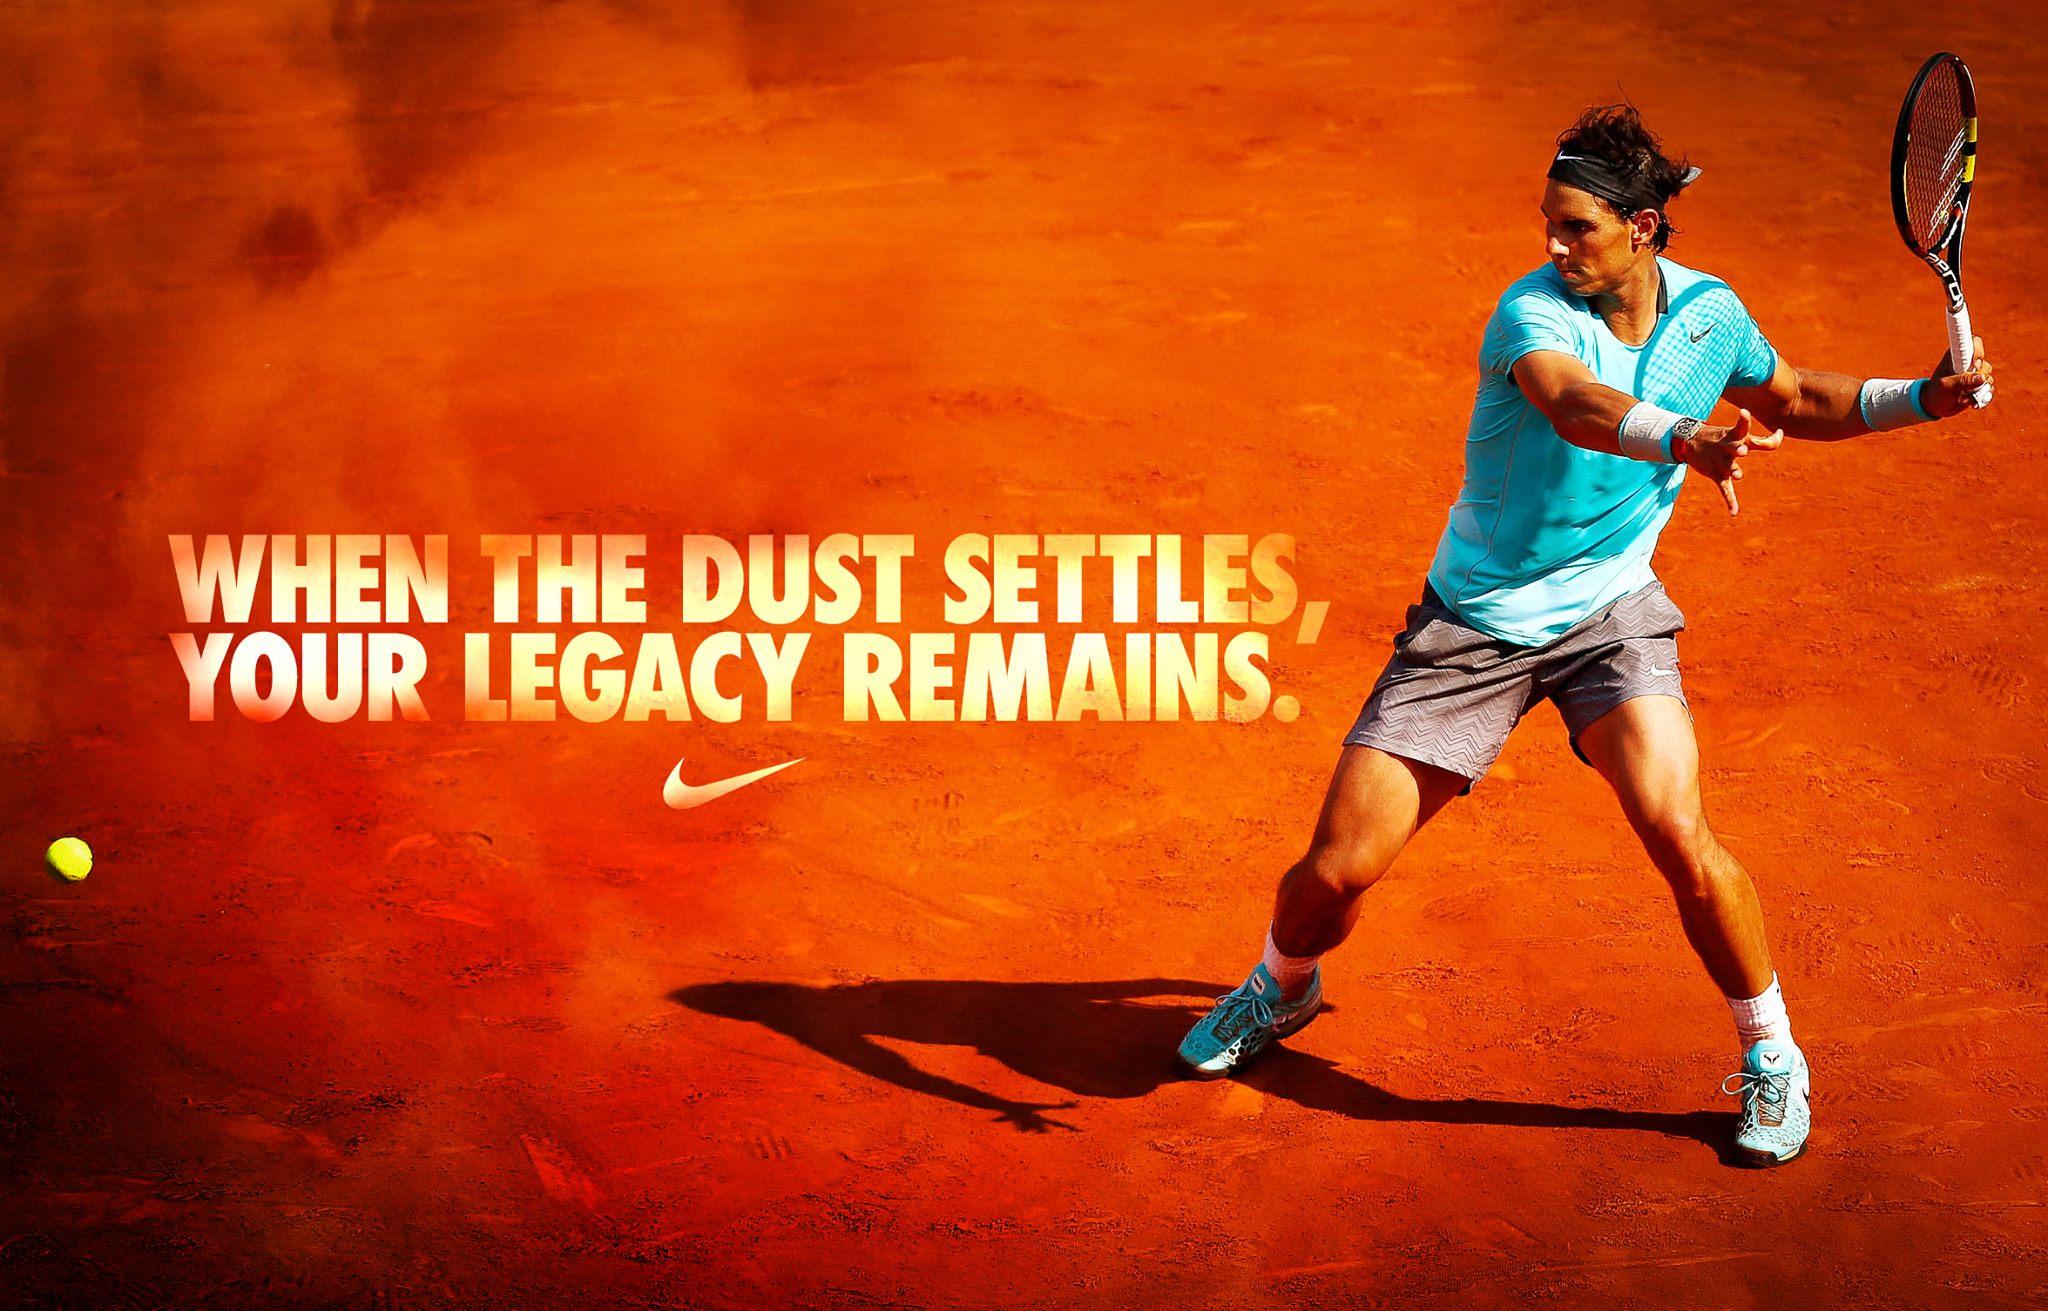 novedad Cadena recuperar  Rafael Nadal Wallpaper Nike posted by Christopher Tremblay